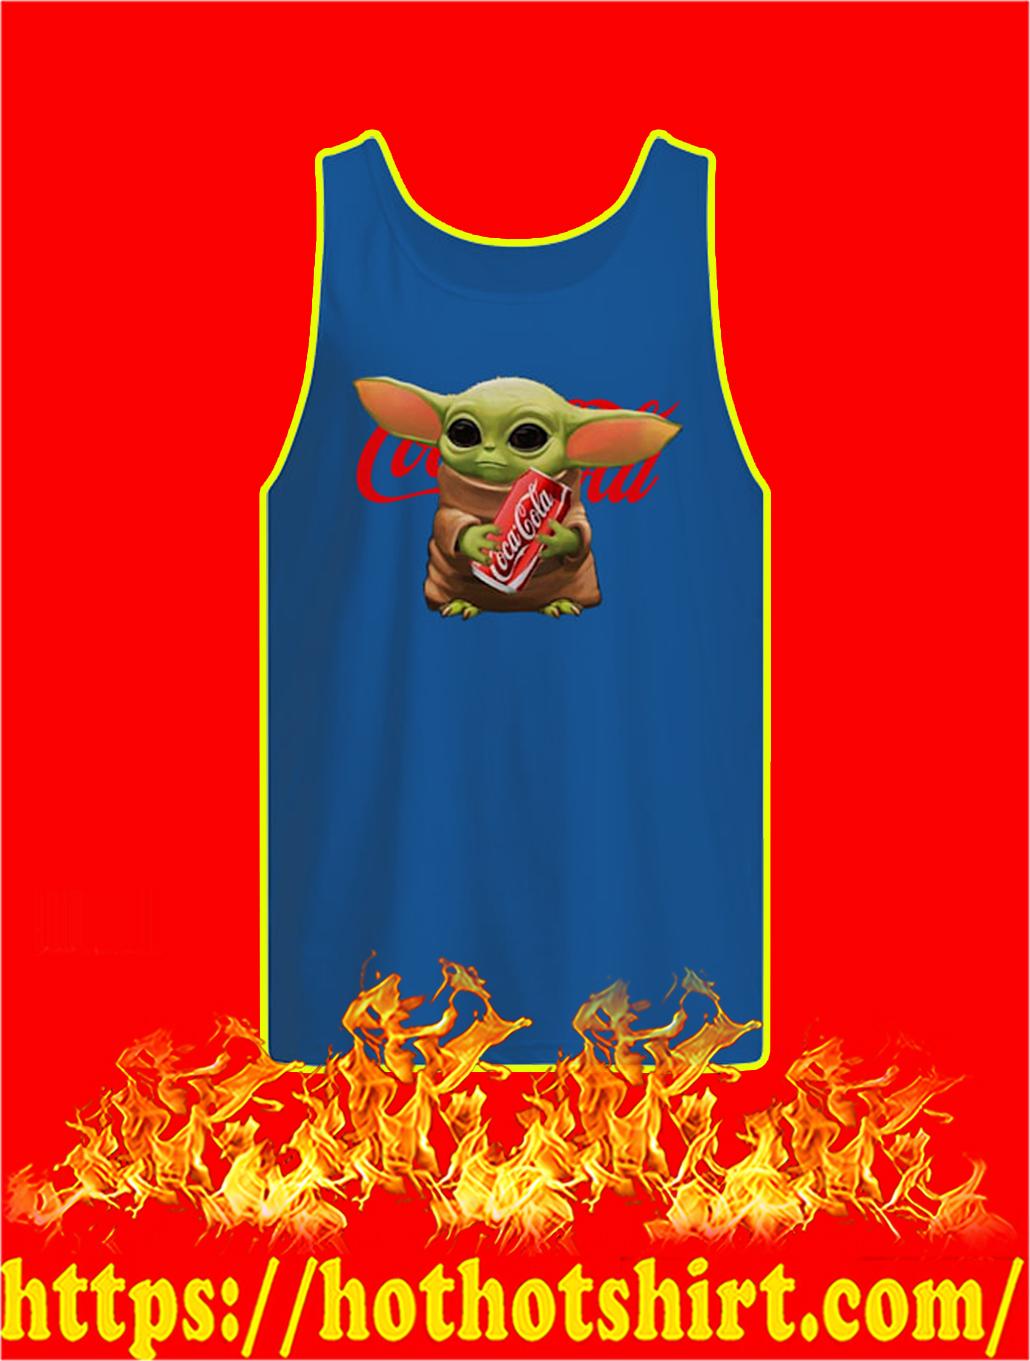 Baby Yoda Hug Coca Cola tank topBaby Yoda Hug Coca Cola tank top